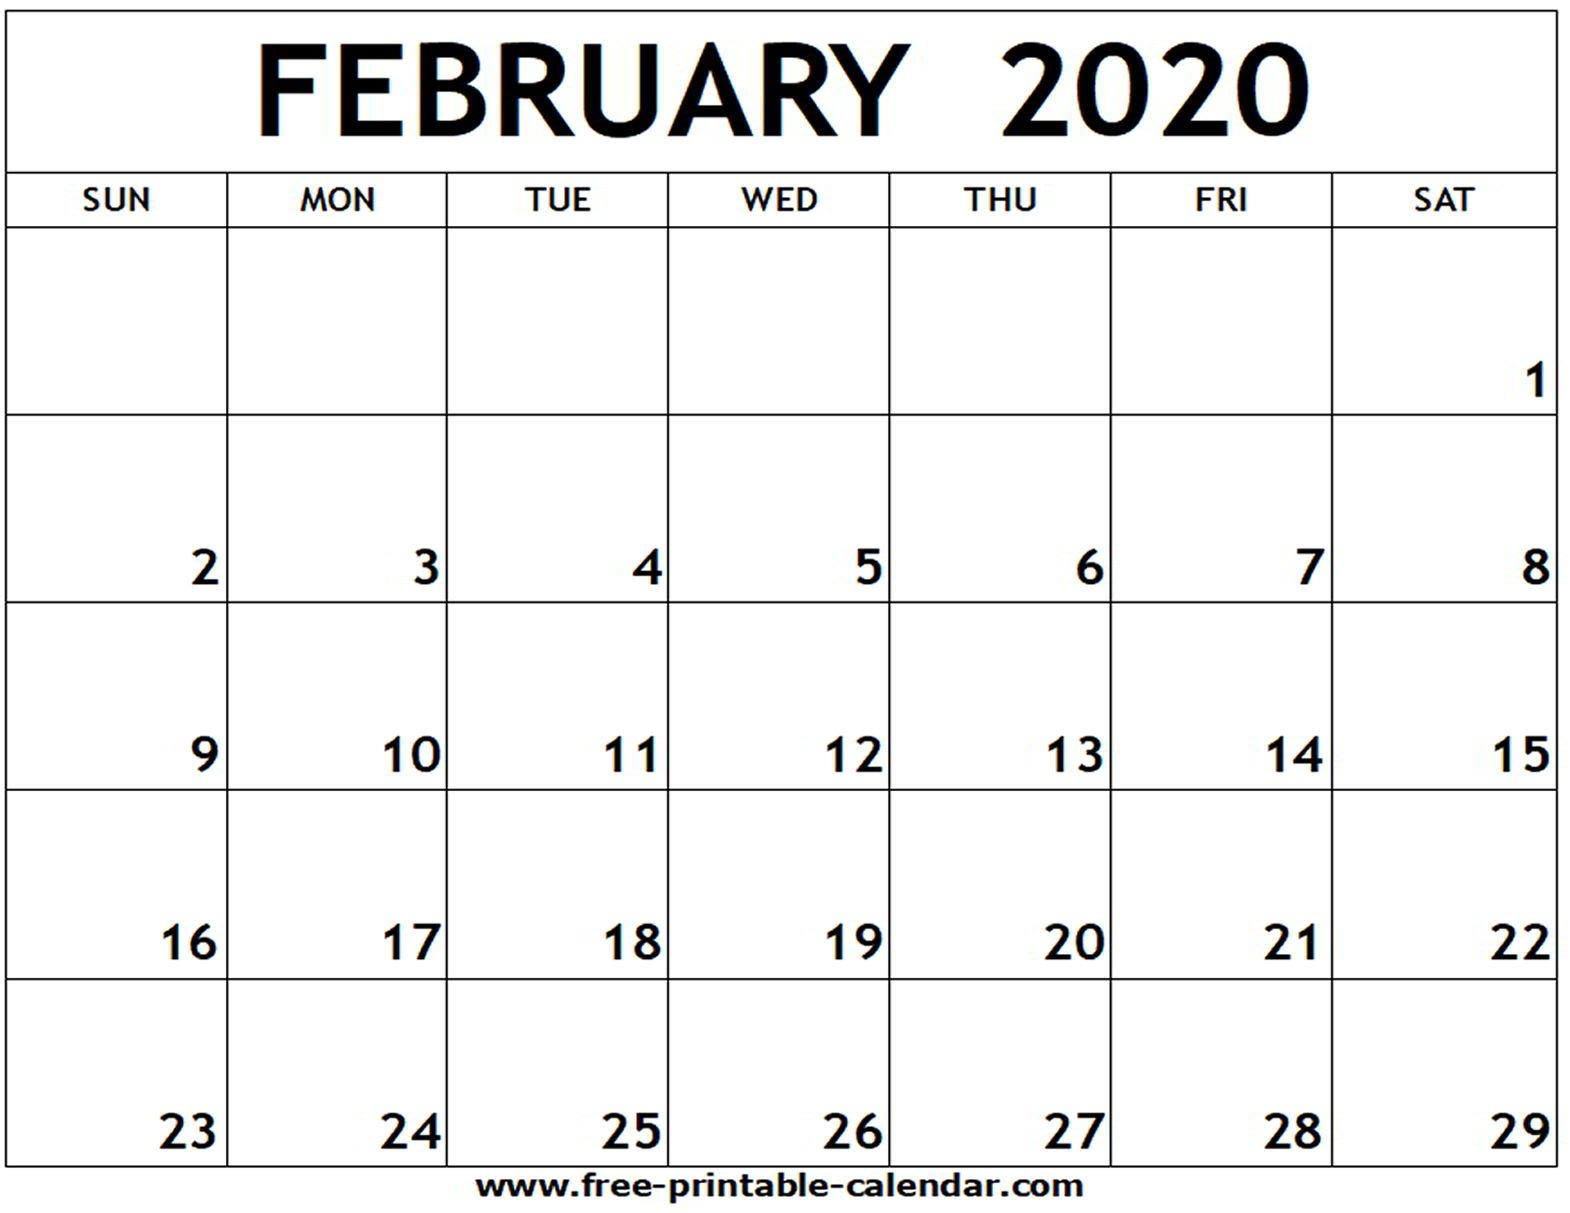 February 2020 Printable Calendar – Free Printable Calendar Blank Calendar I Can Edit And Print